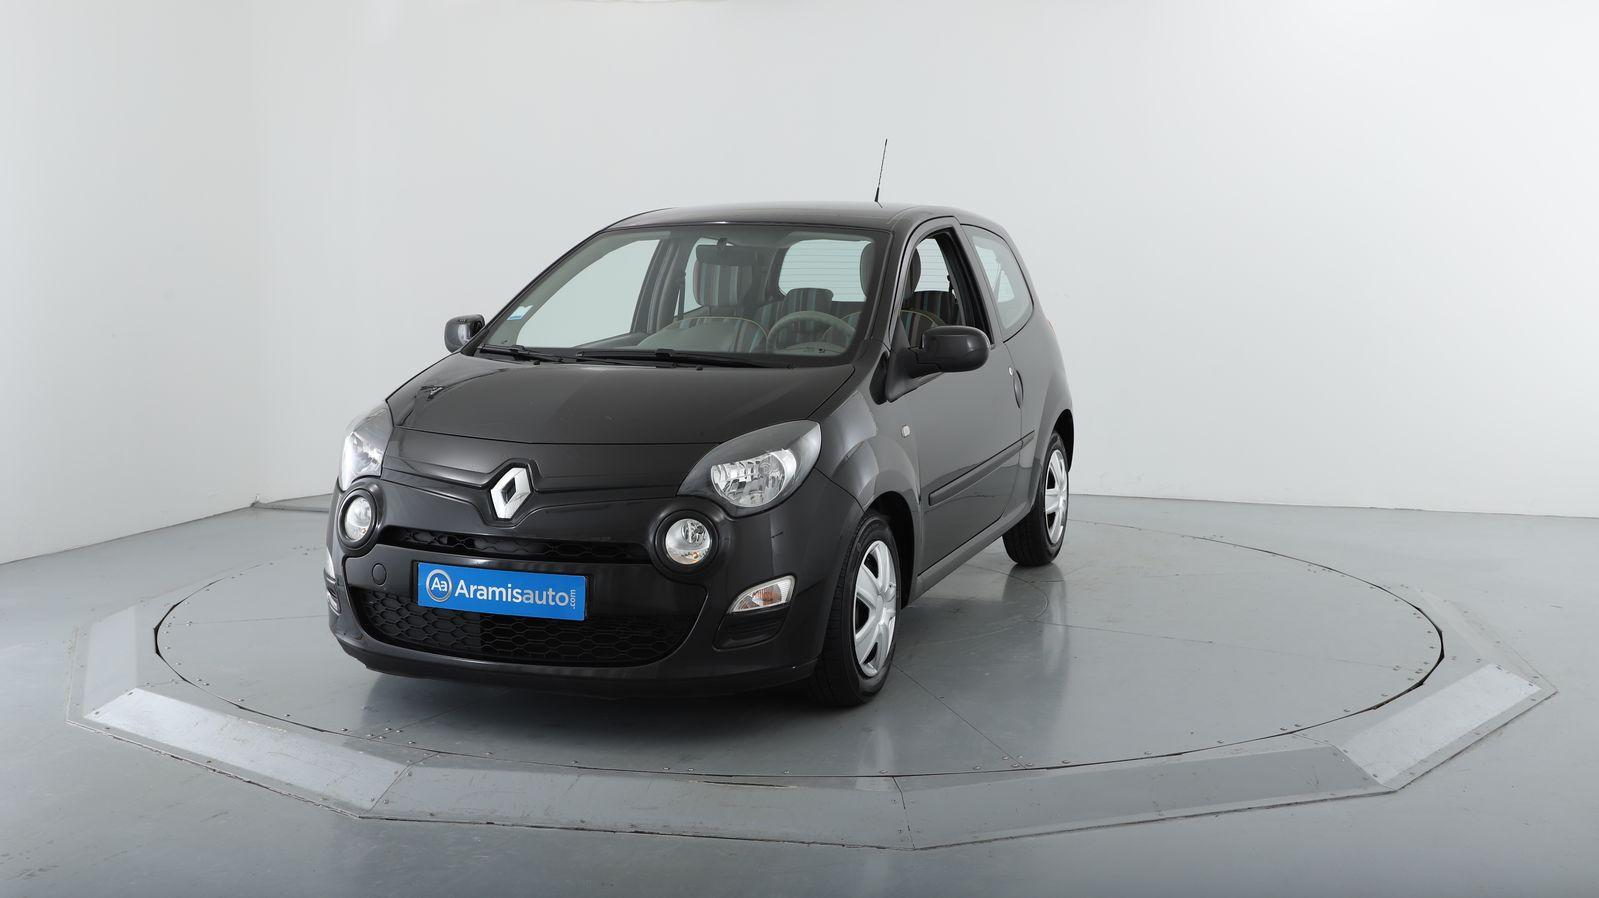 Renault Twingo 2 - Citadine - 3 portes - Essence - 1.2 75 BVM5 - Boîte  manuelle - Finition Limited - rv378486 - Aramisauto